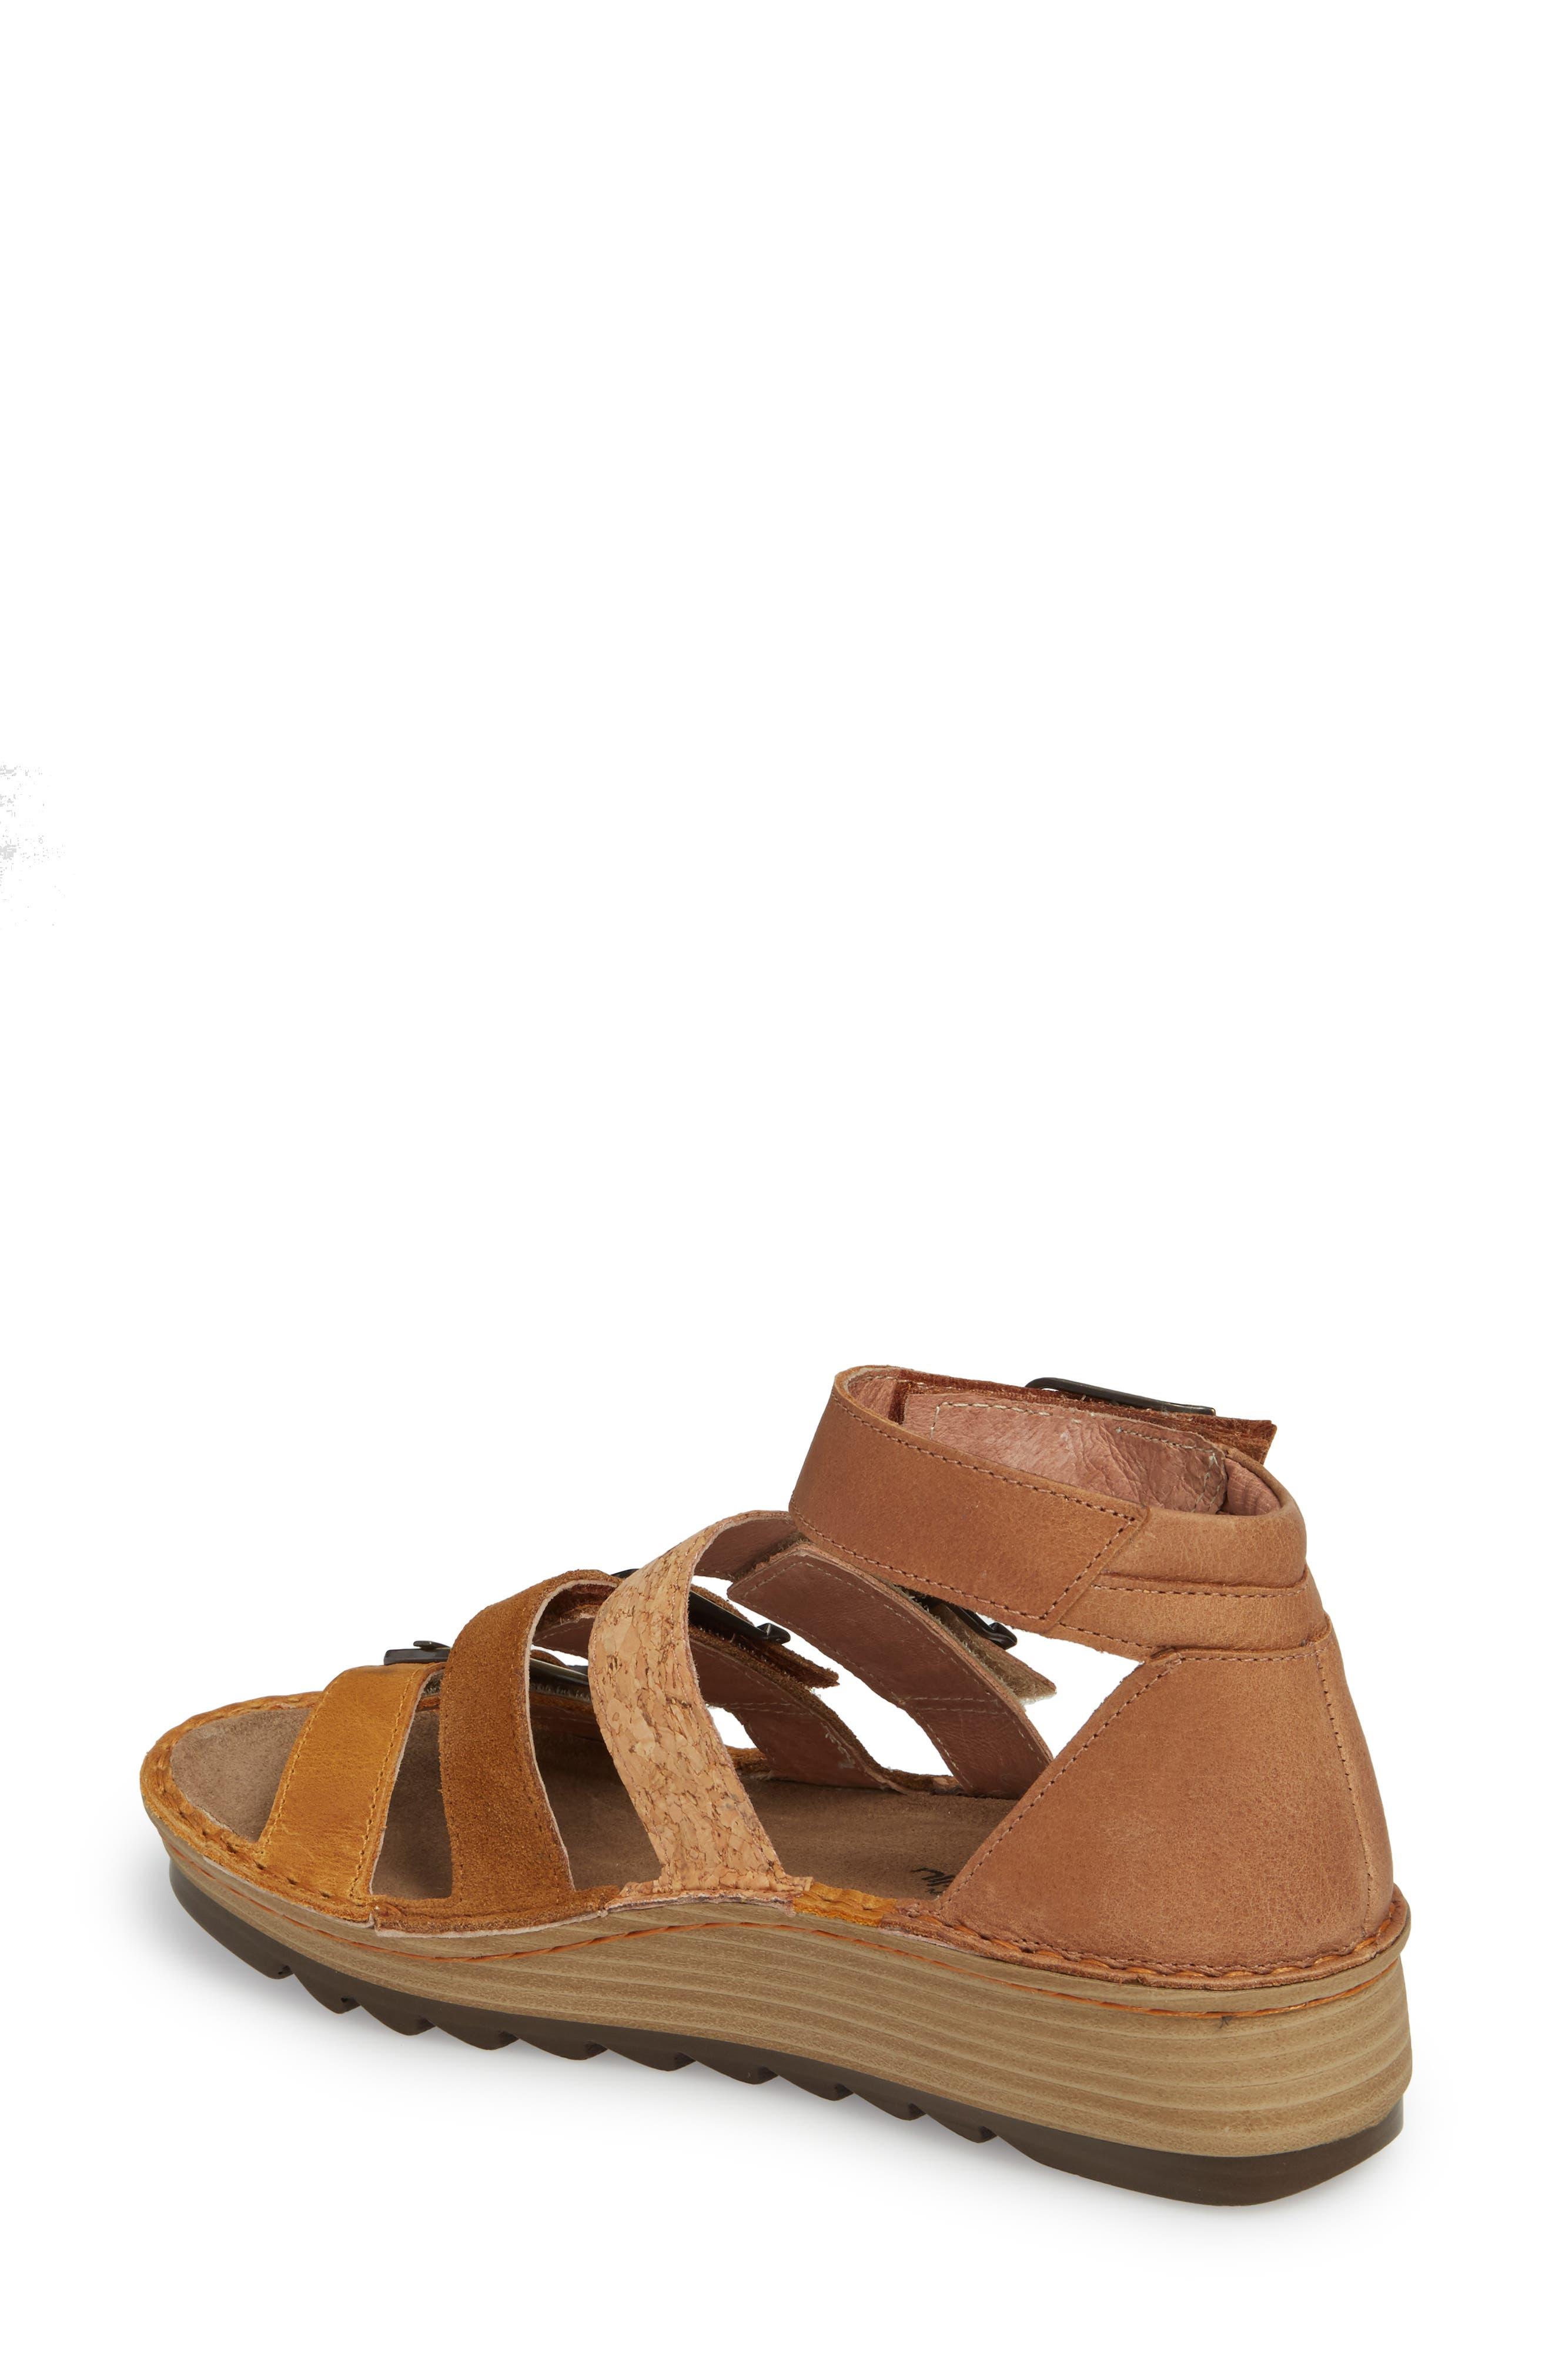 'Begonia' Sandal,                             Alternate thumbnail 2, color,                             OILY DUNE NUBUCK